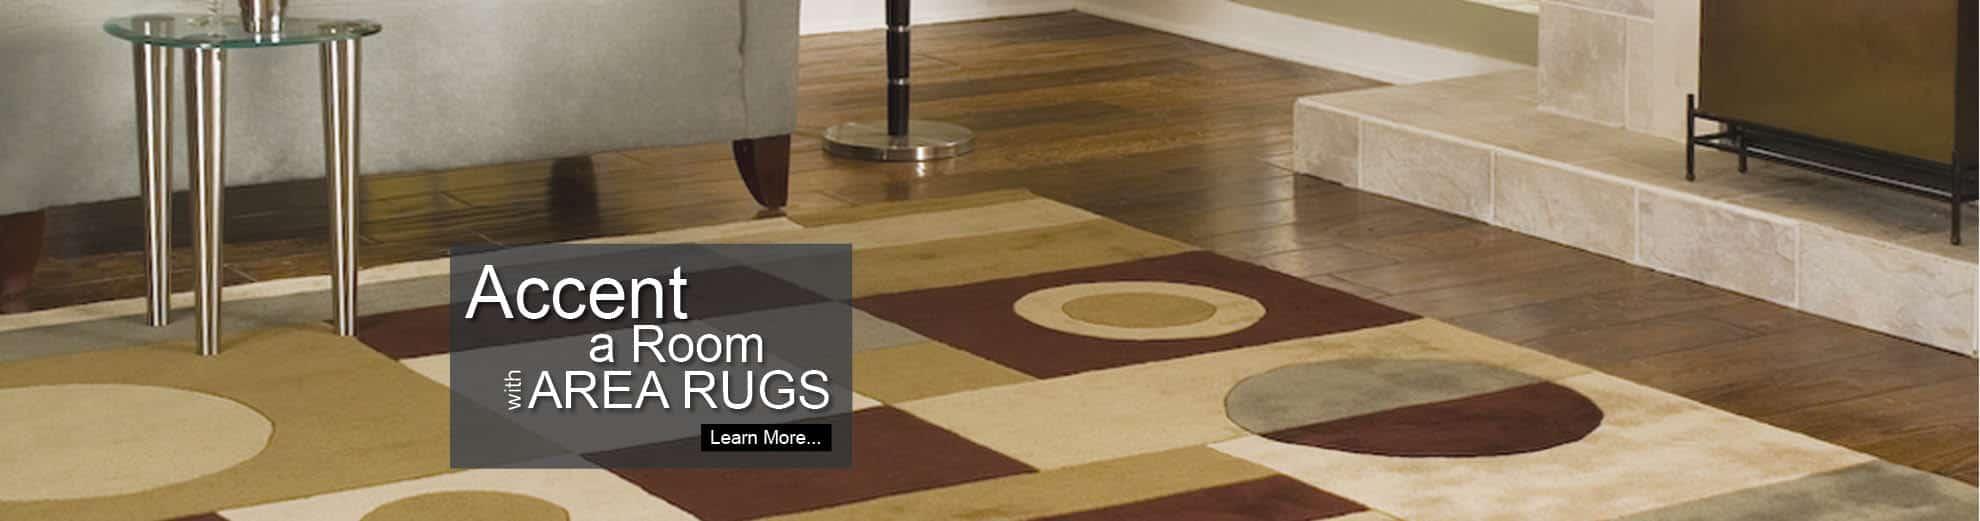 area rug 1c 150